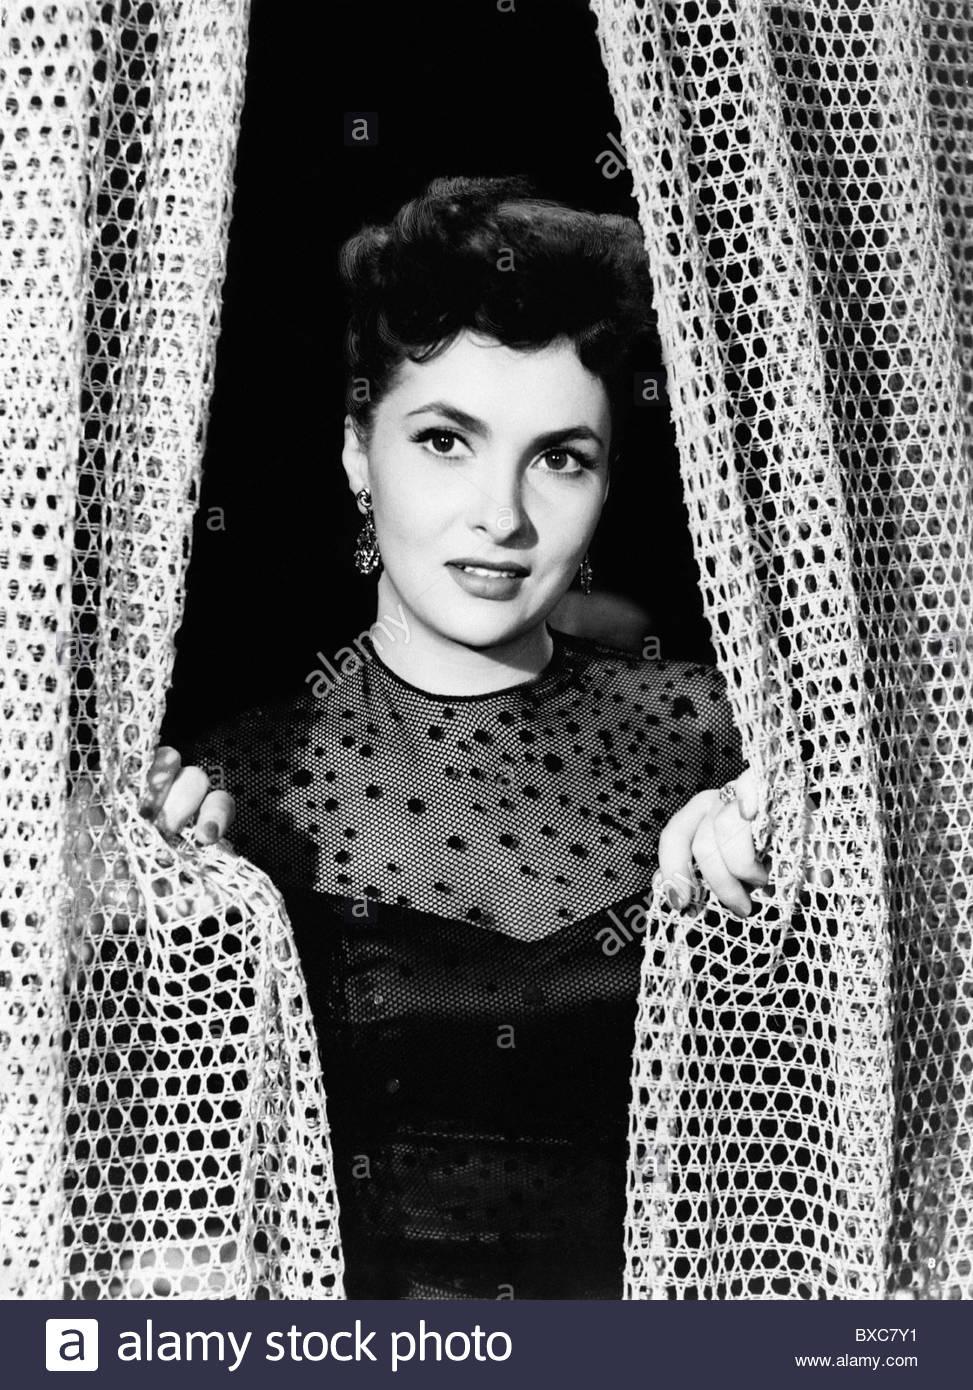 Lollobrigida, Gina, * 4.7.1927, Italian actress, half length, movie scene from 'Four Ways Out', 1951, Additional - Stock Image